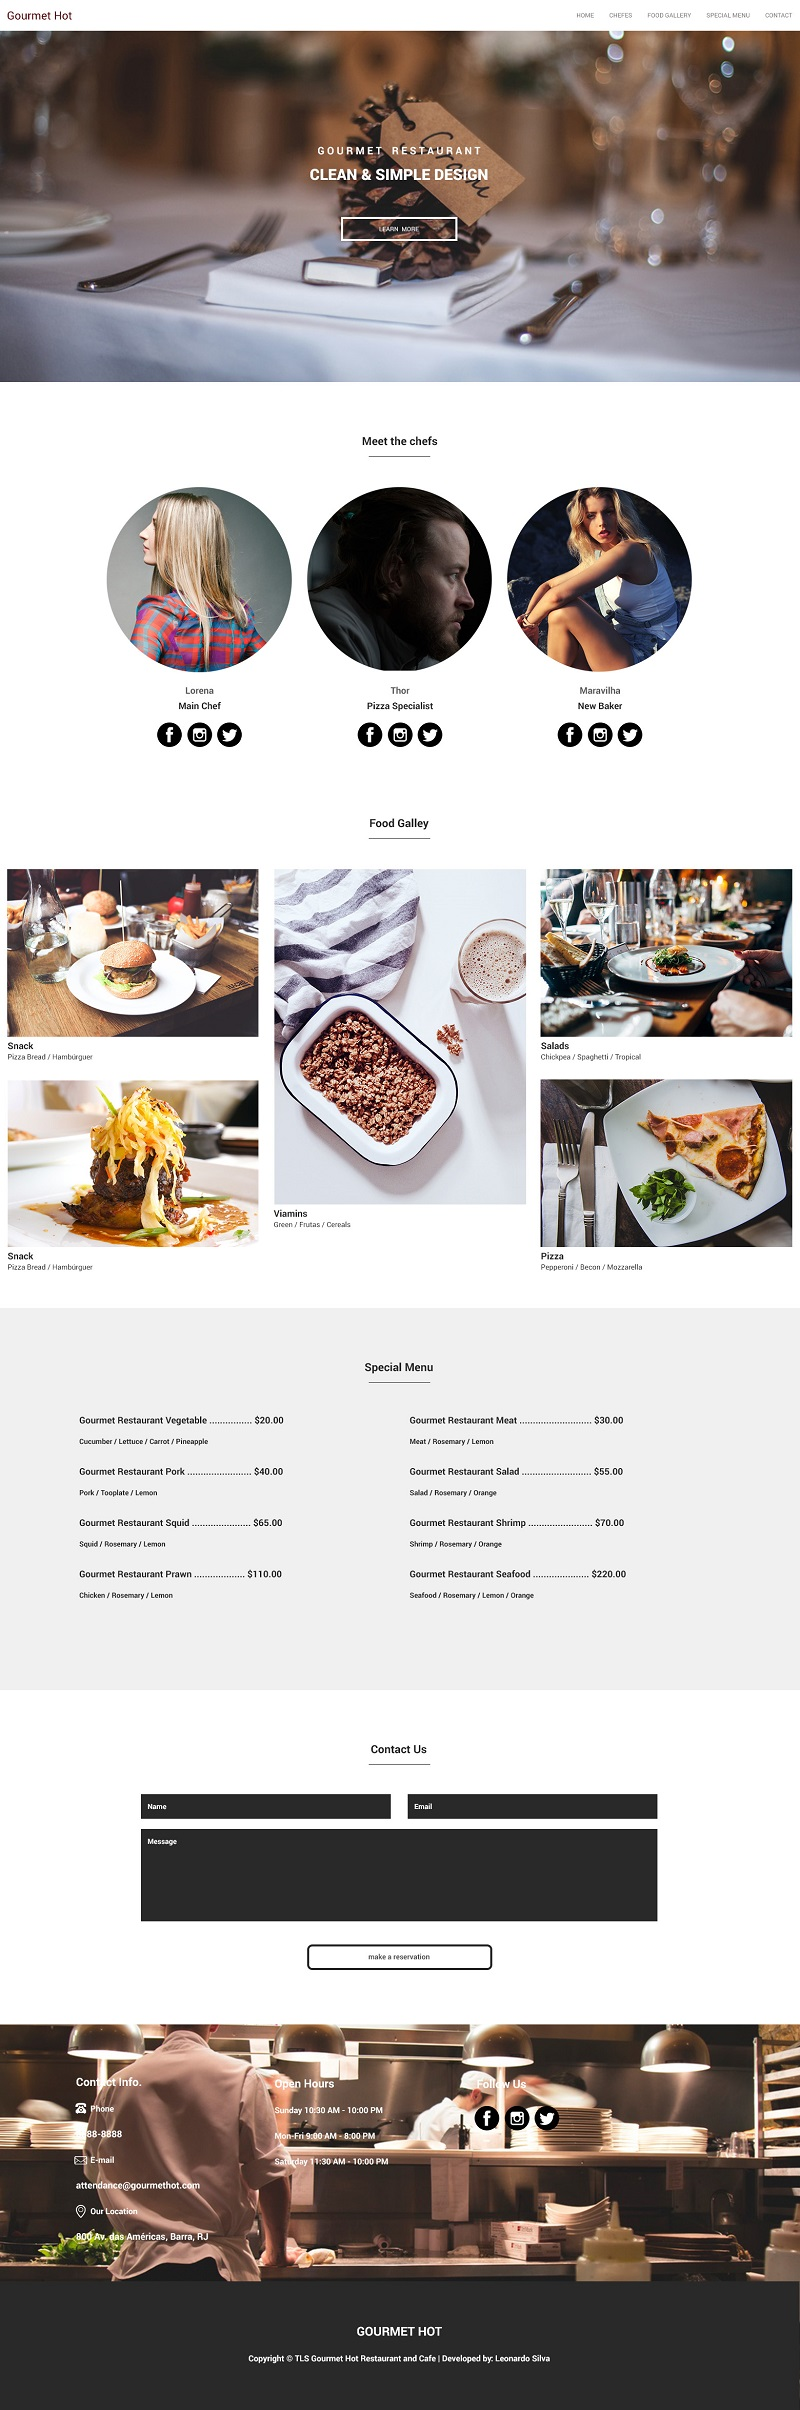 Tema GourmetHot